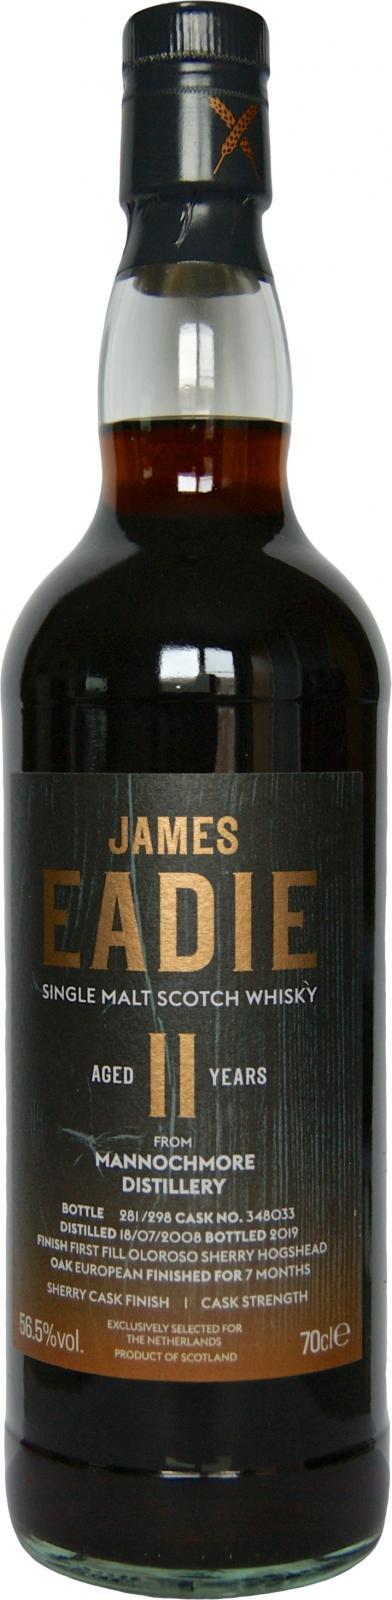 Mannochmore 11 yrs James Eadie